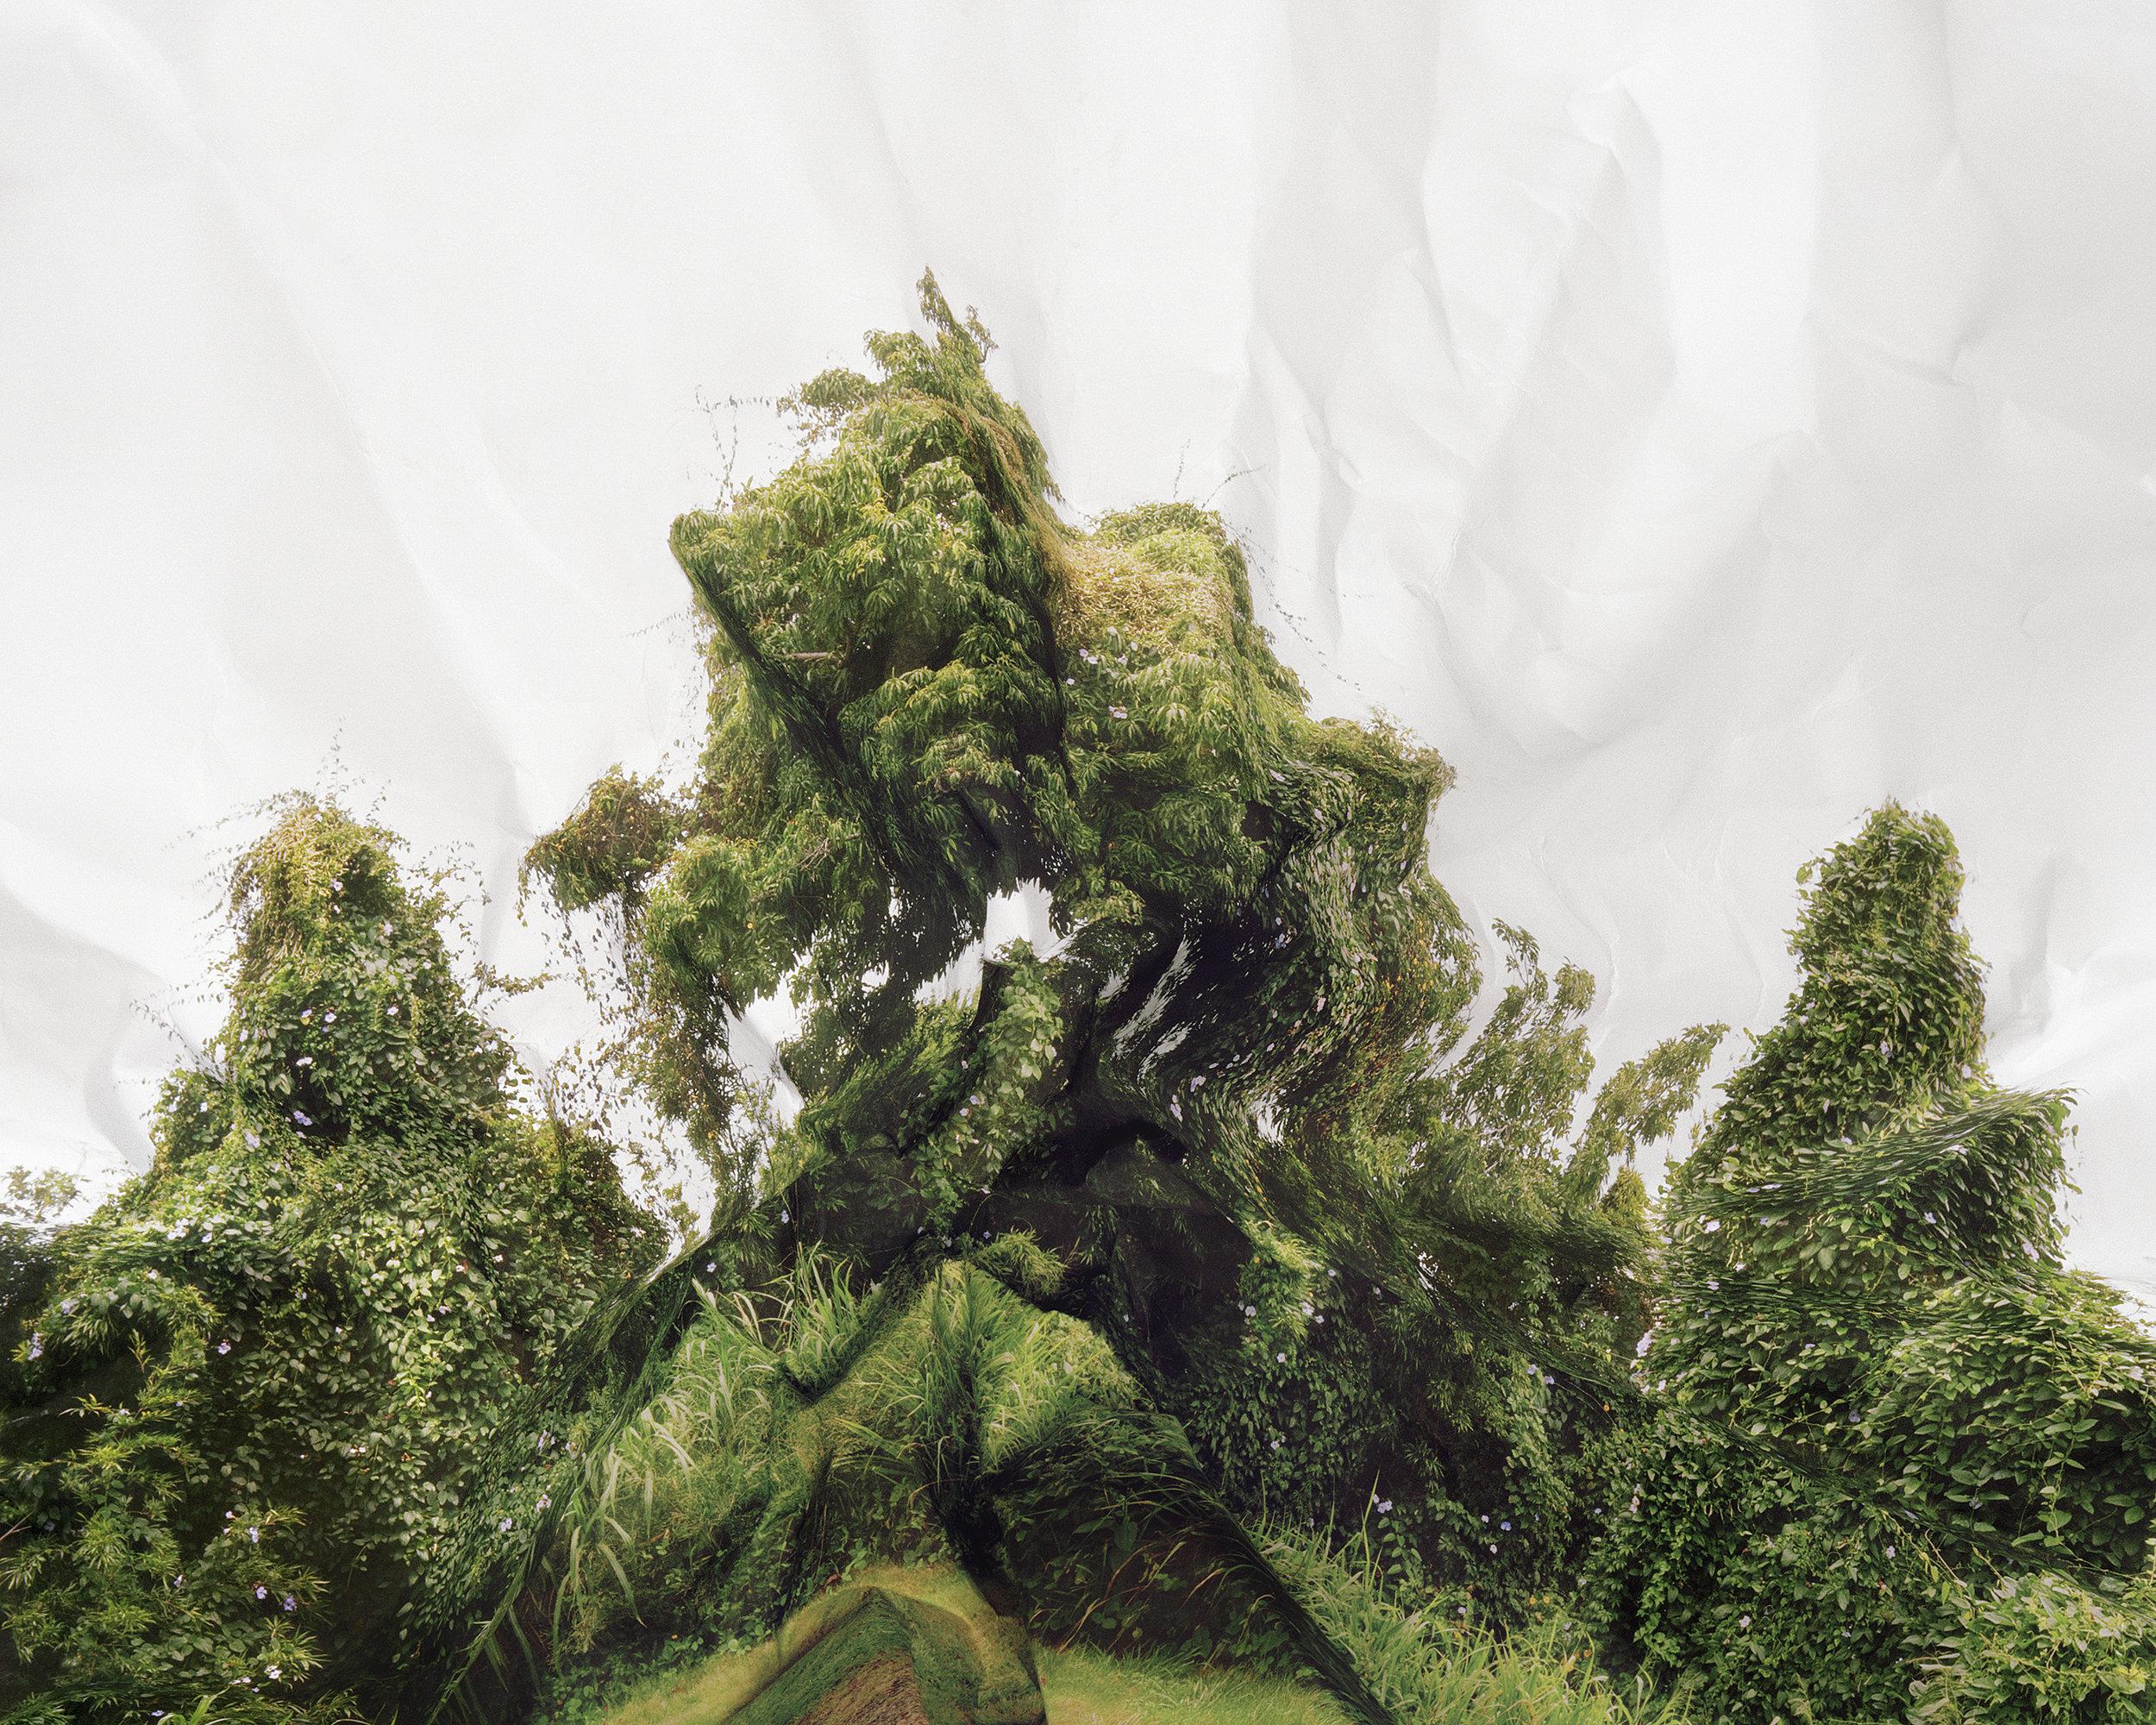 Laura Plageman,  Response to Trumpet Vine, Hawaii , 2011  Digital pigment print, 16 x 20 in, edition of 10   Inquire